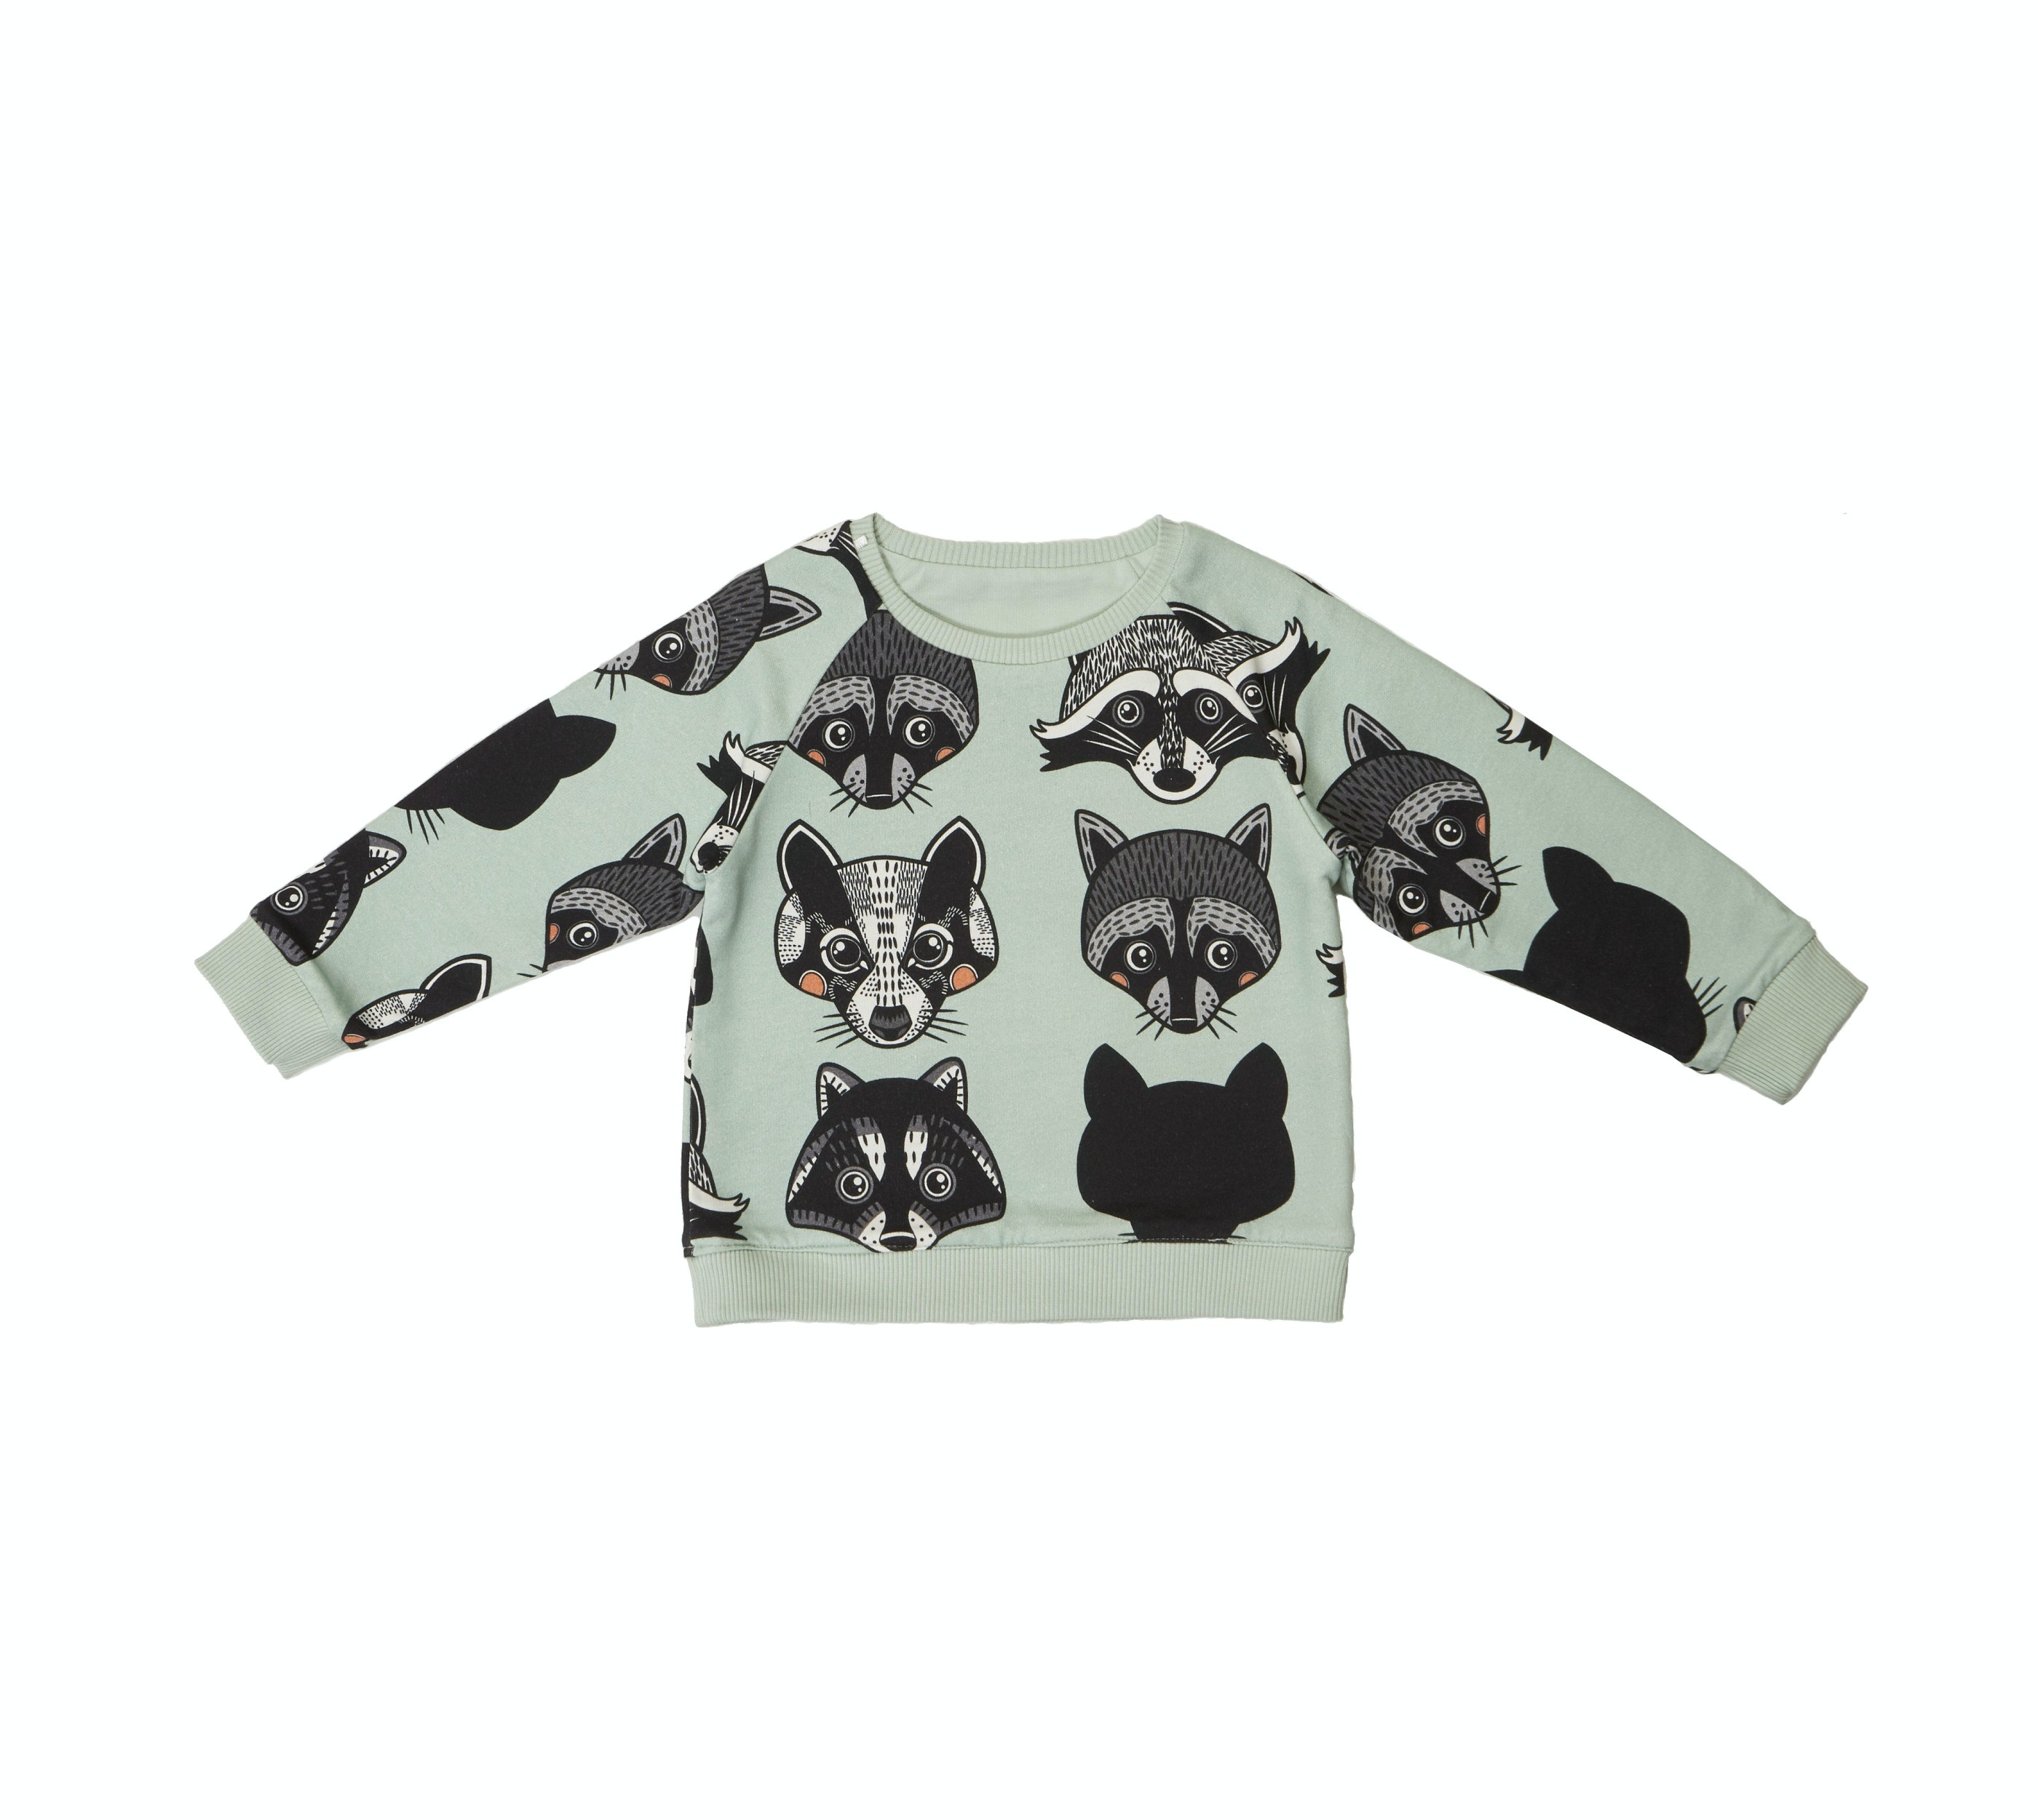 18SSRSR Reversible sweatshirt Raccoon AOP side